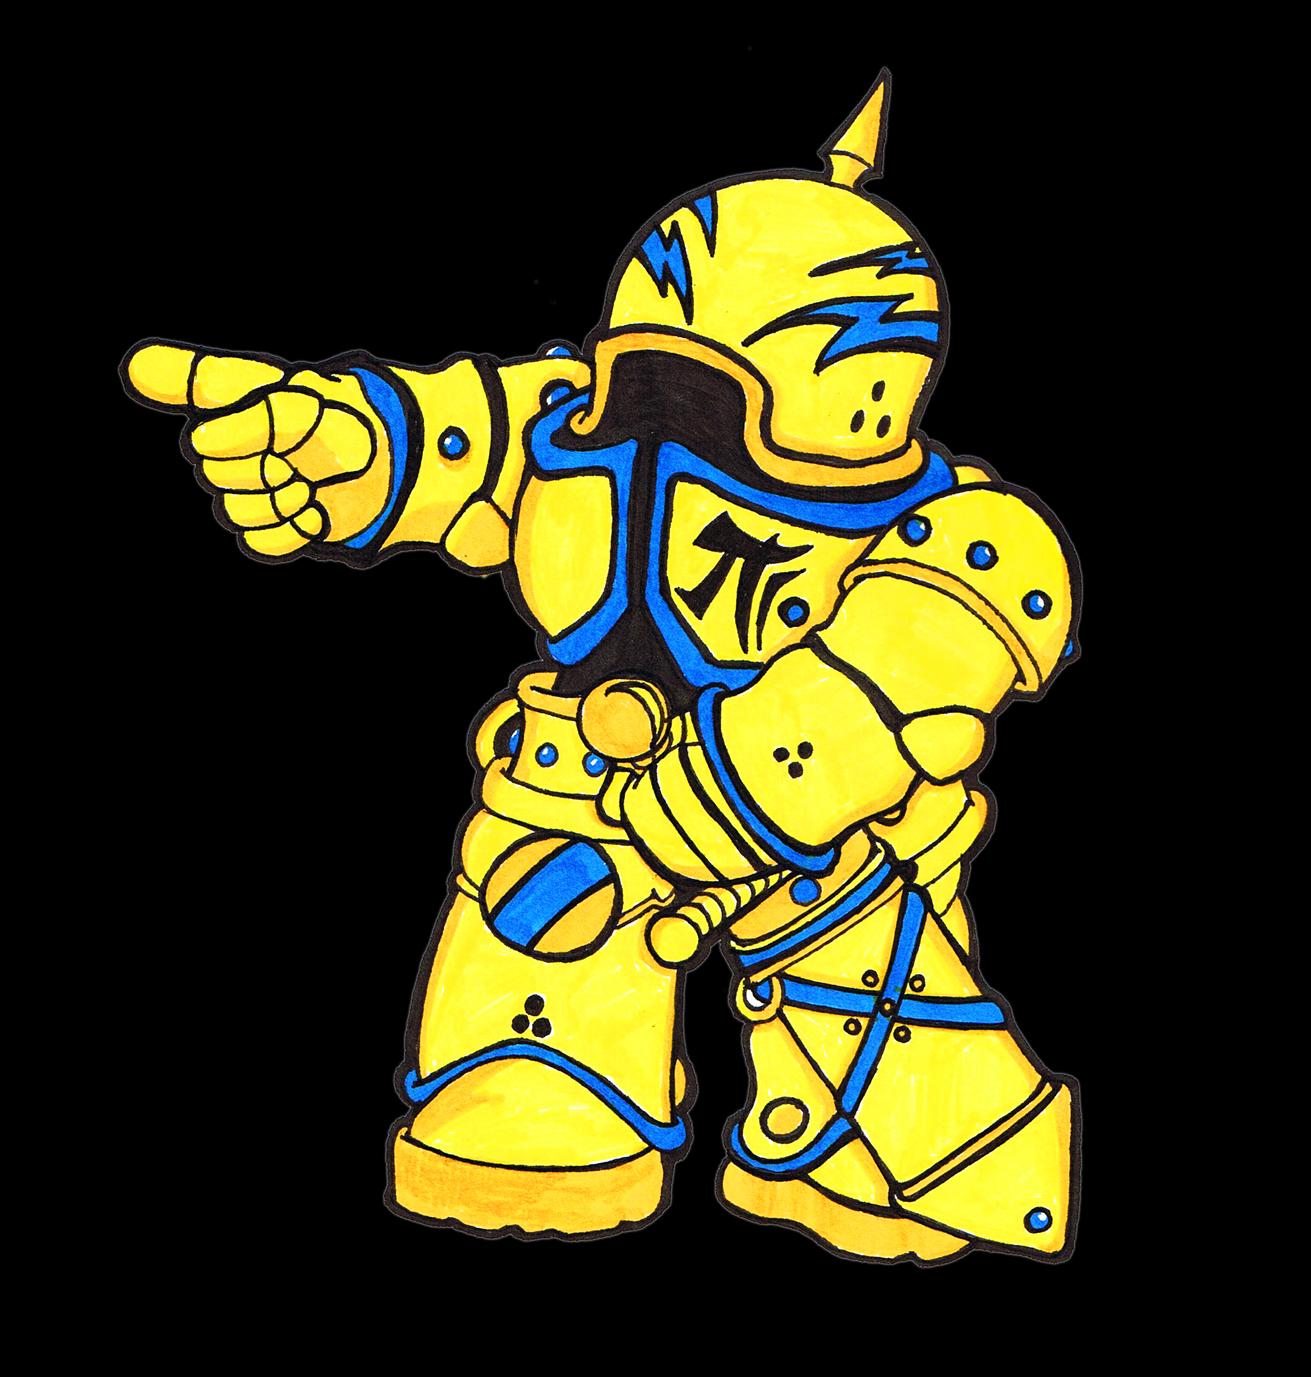 The little Robo-Knight